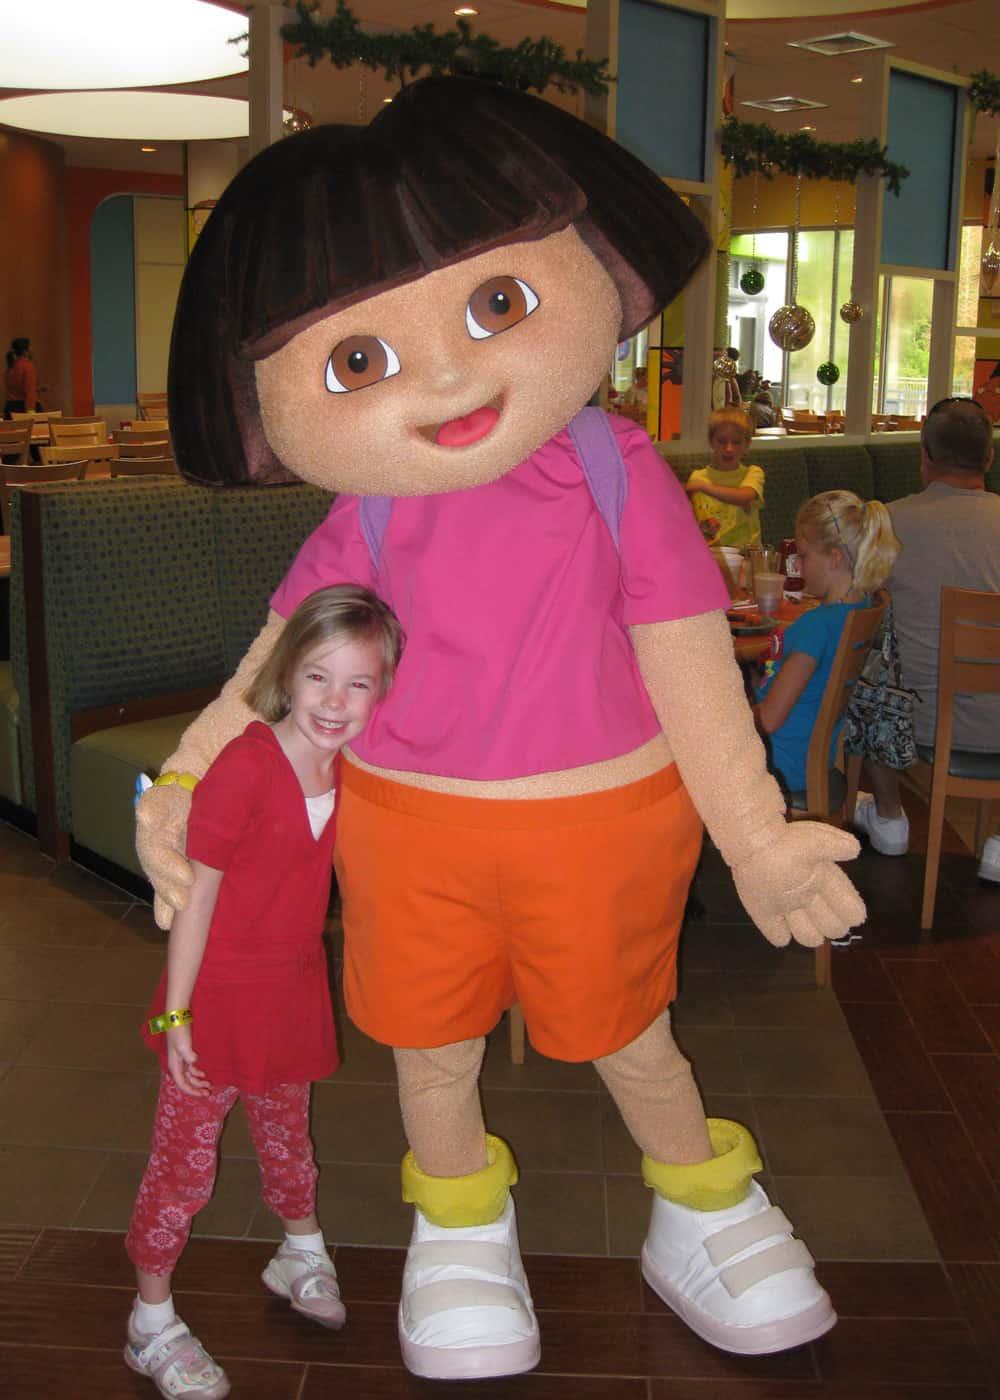 Dora the Explorer at the Nick Hotel 2009